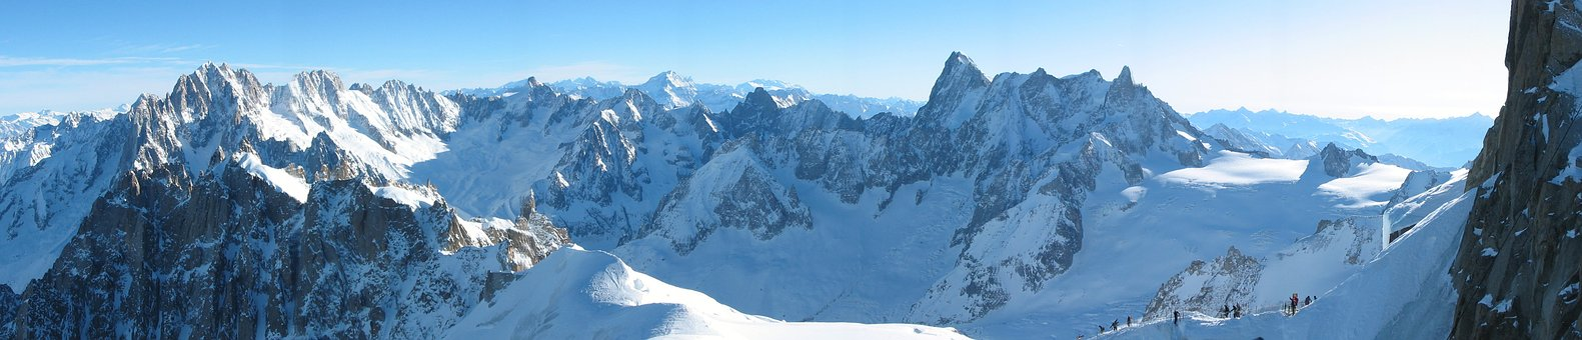 The Alps, Mountains, Winter, Rocks, View, Landscape